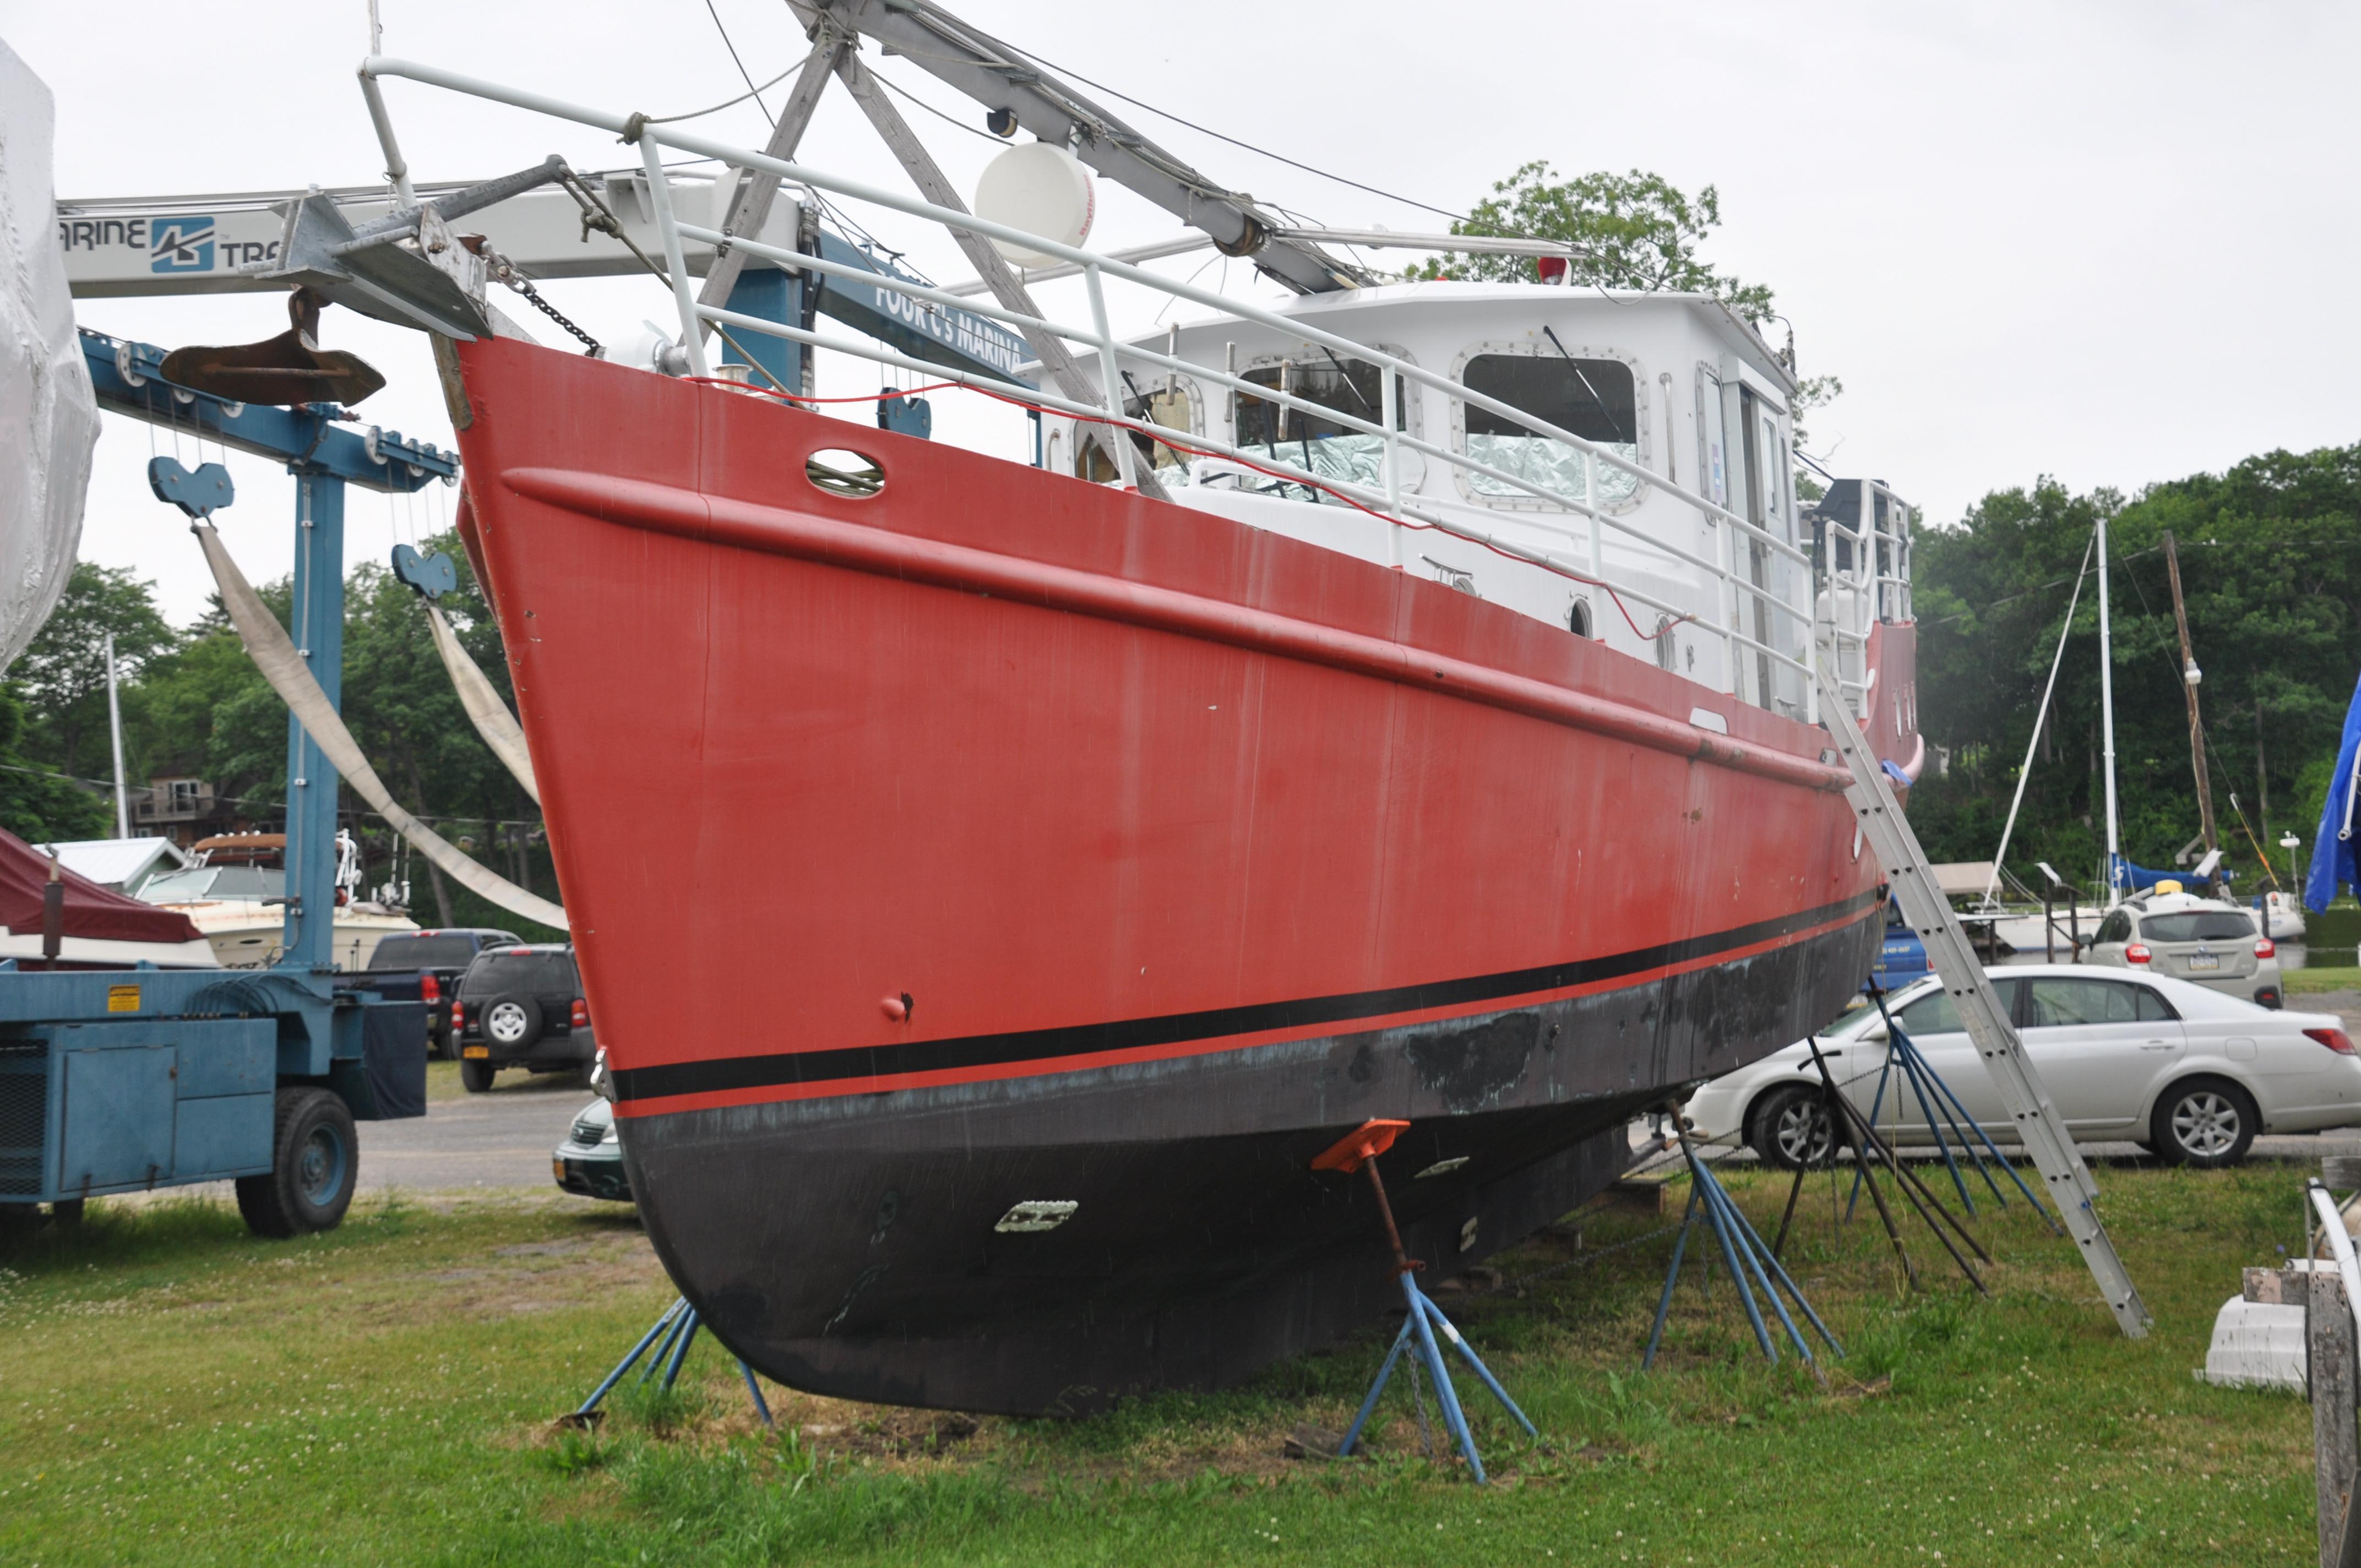 44 seahorse diesel duck 2001 gaijin for sale in lake